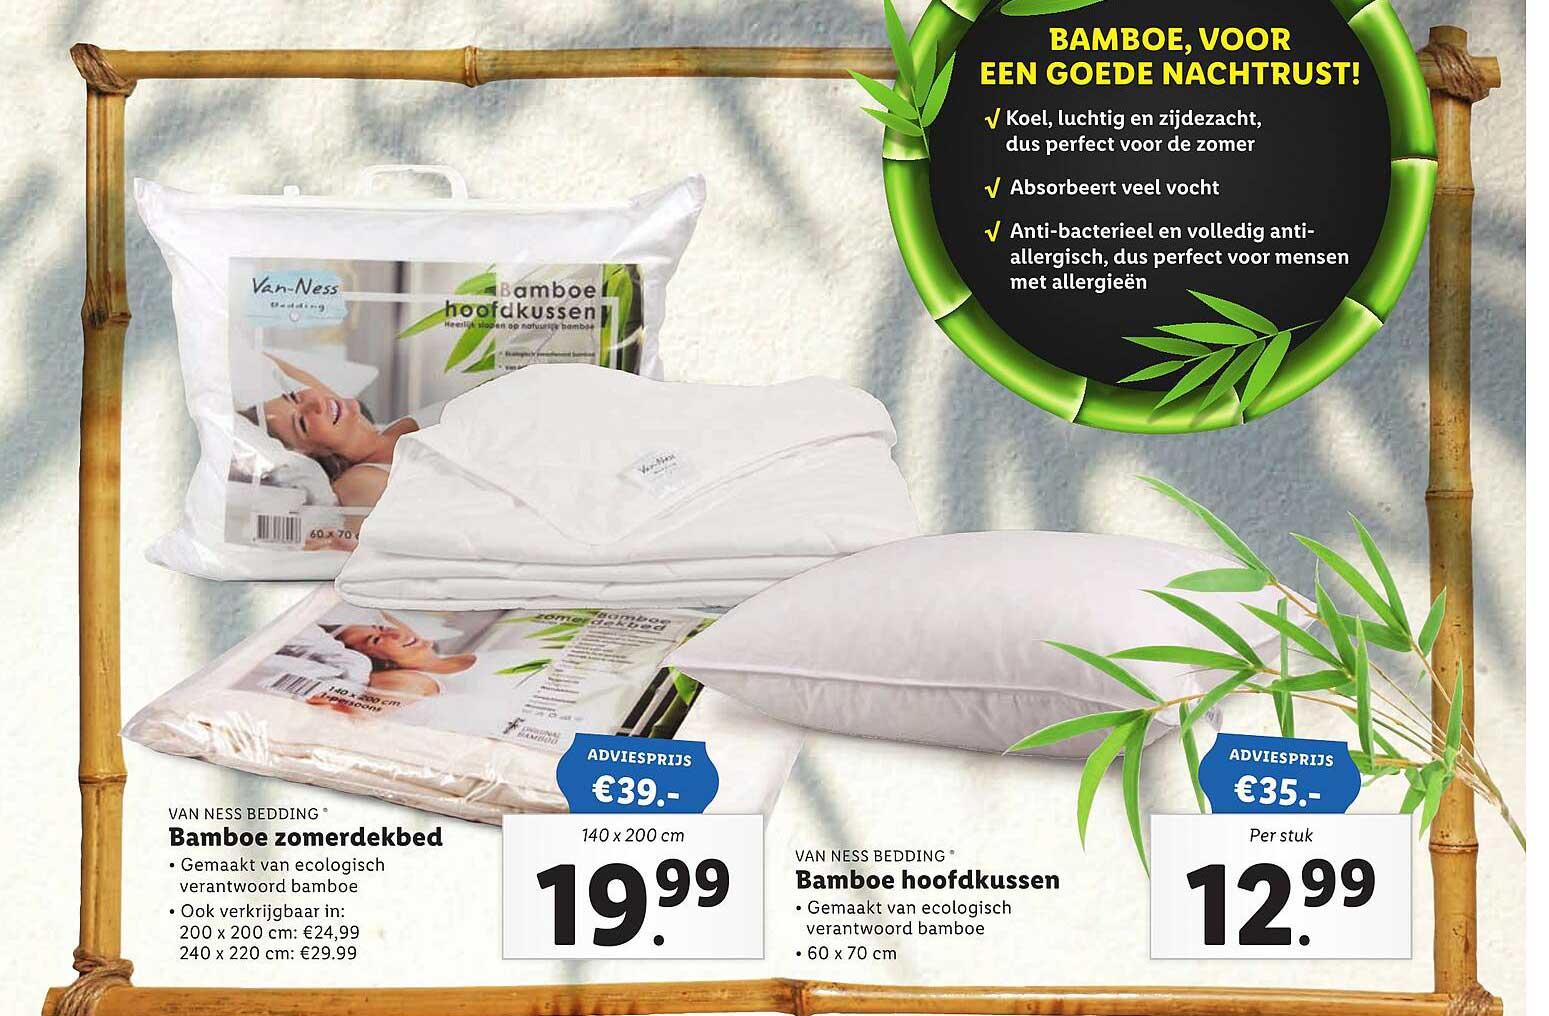 Lidl Van Ness Bedding Bamboe Zomerdekbed Of Bamboe Hoofdkussen